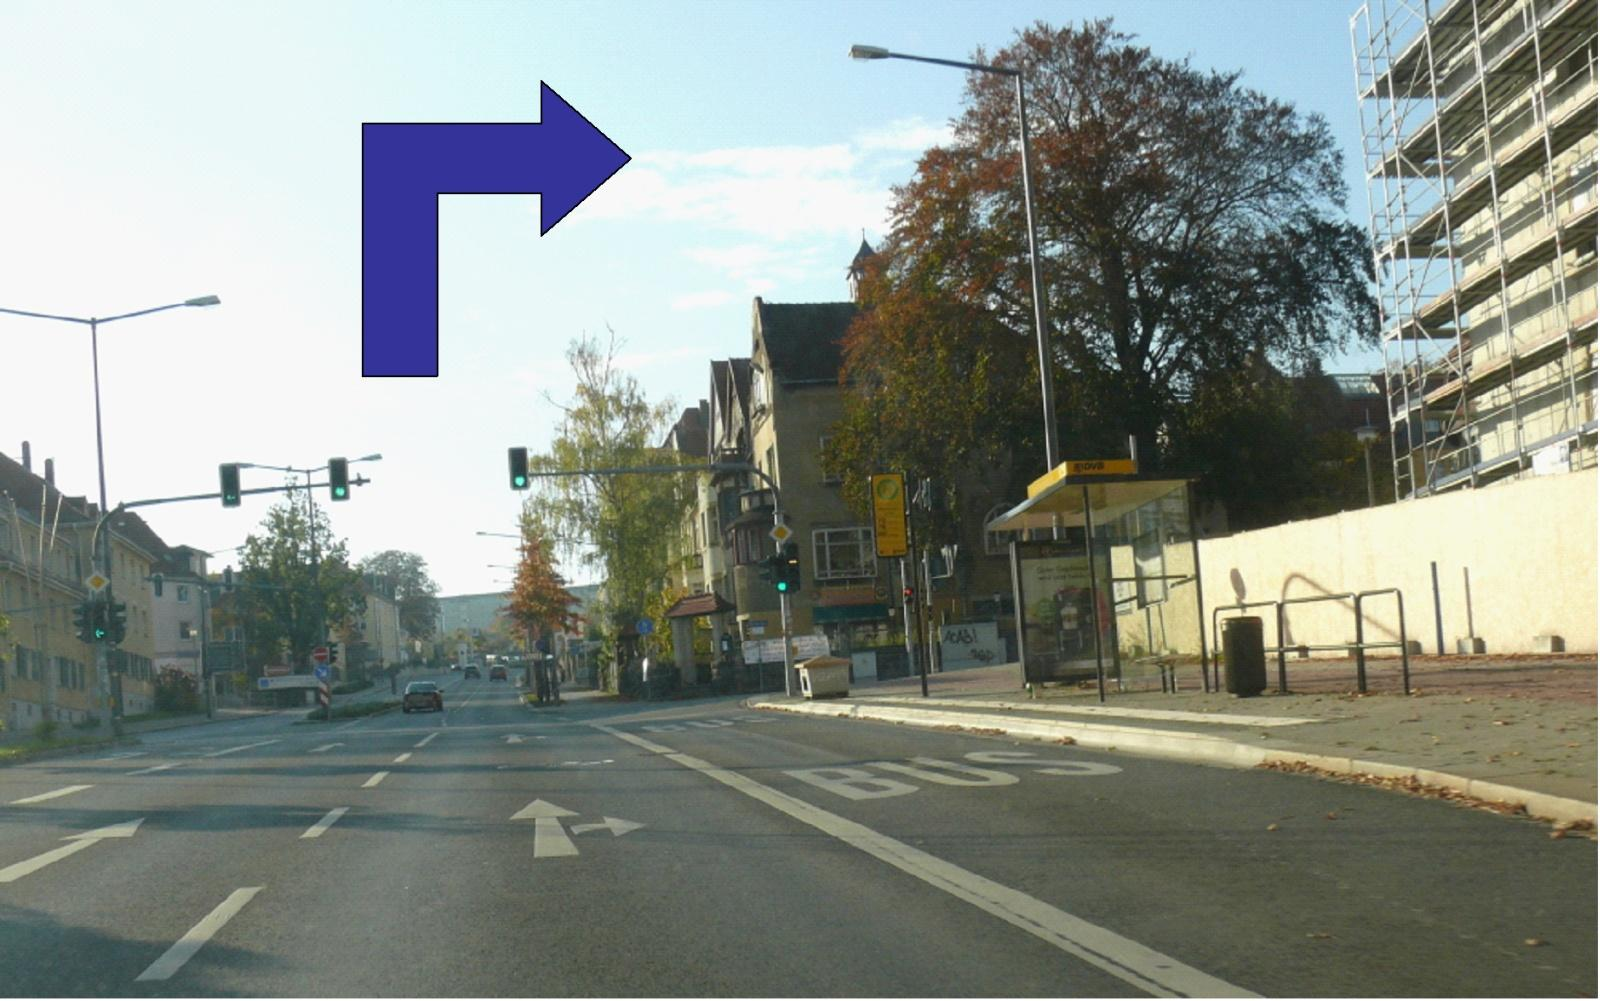 taking right turn